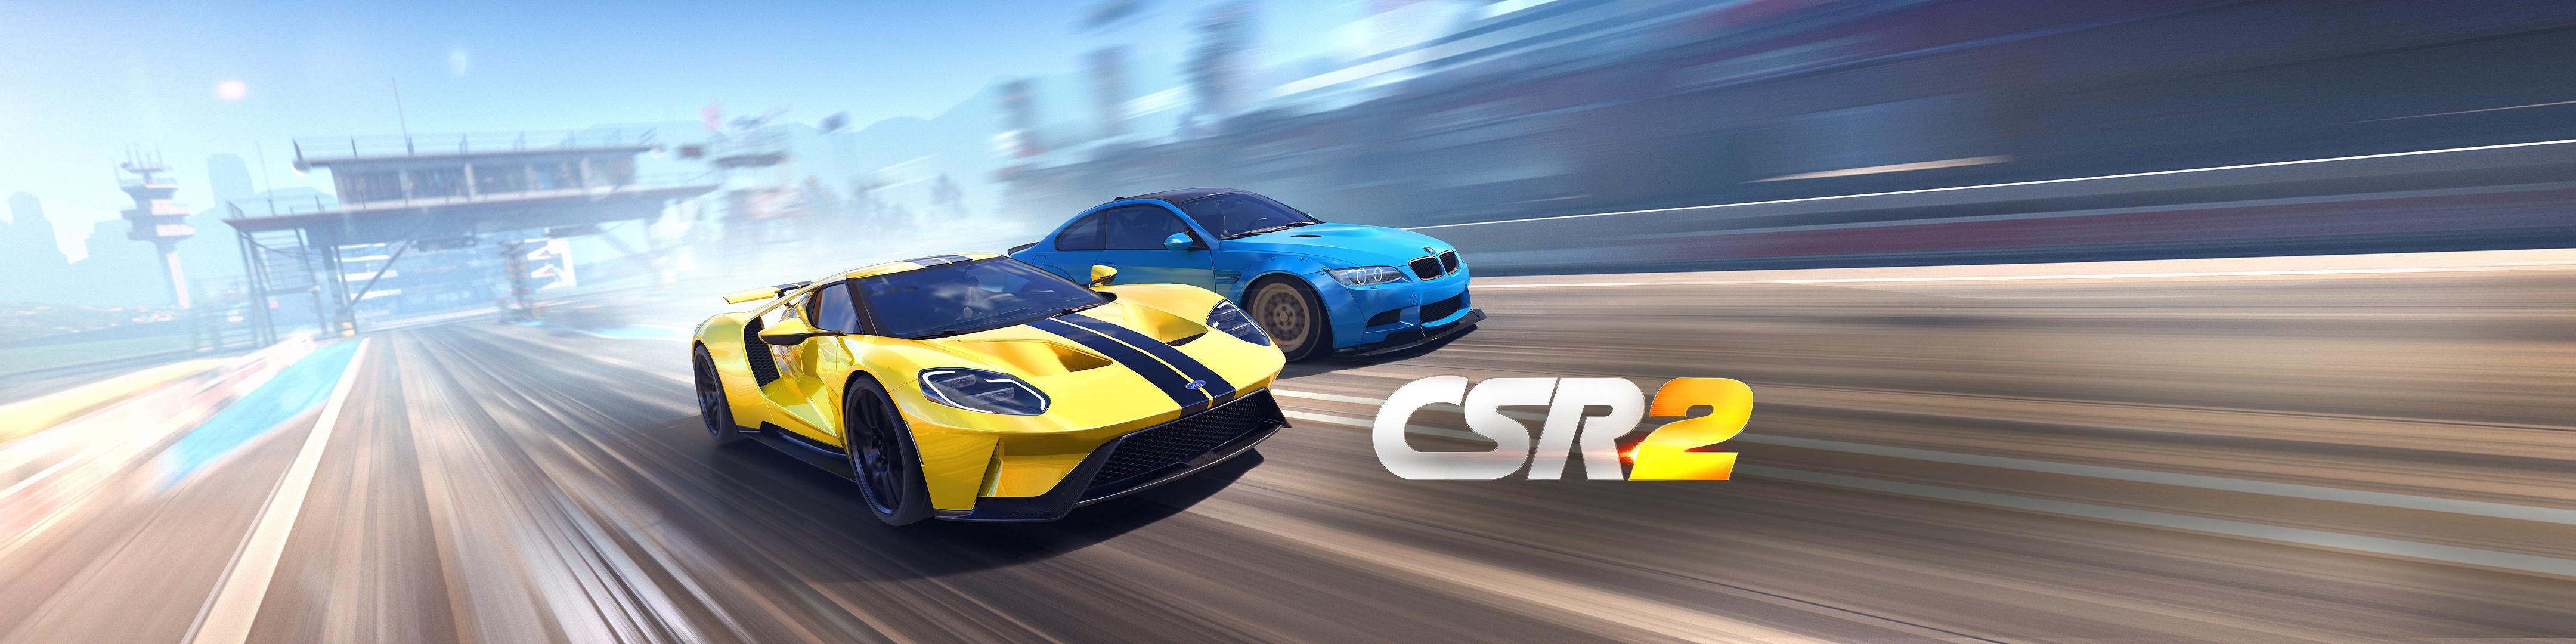 CSR Racing 2 - Revenue & Download estimates - Apple App Store - US